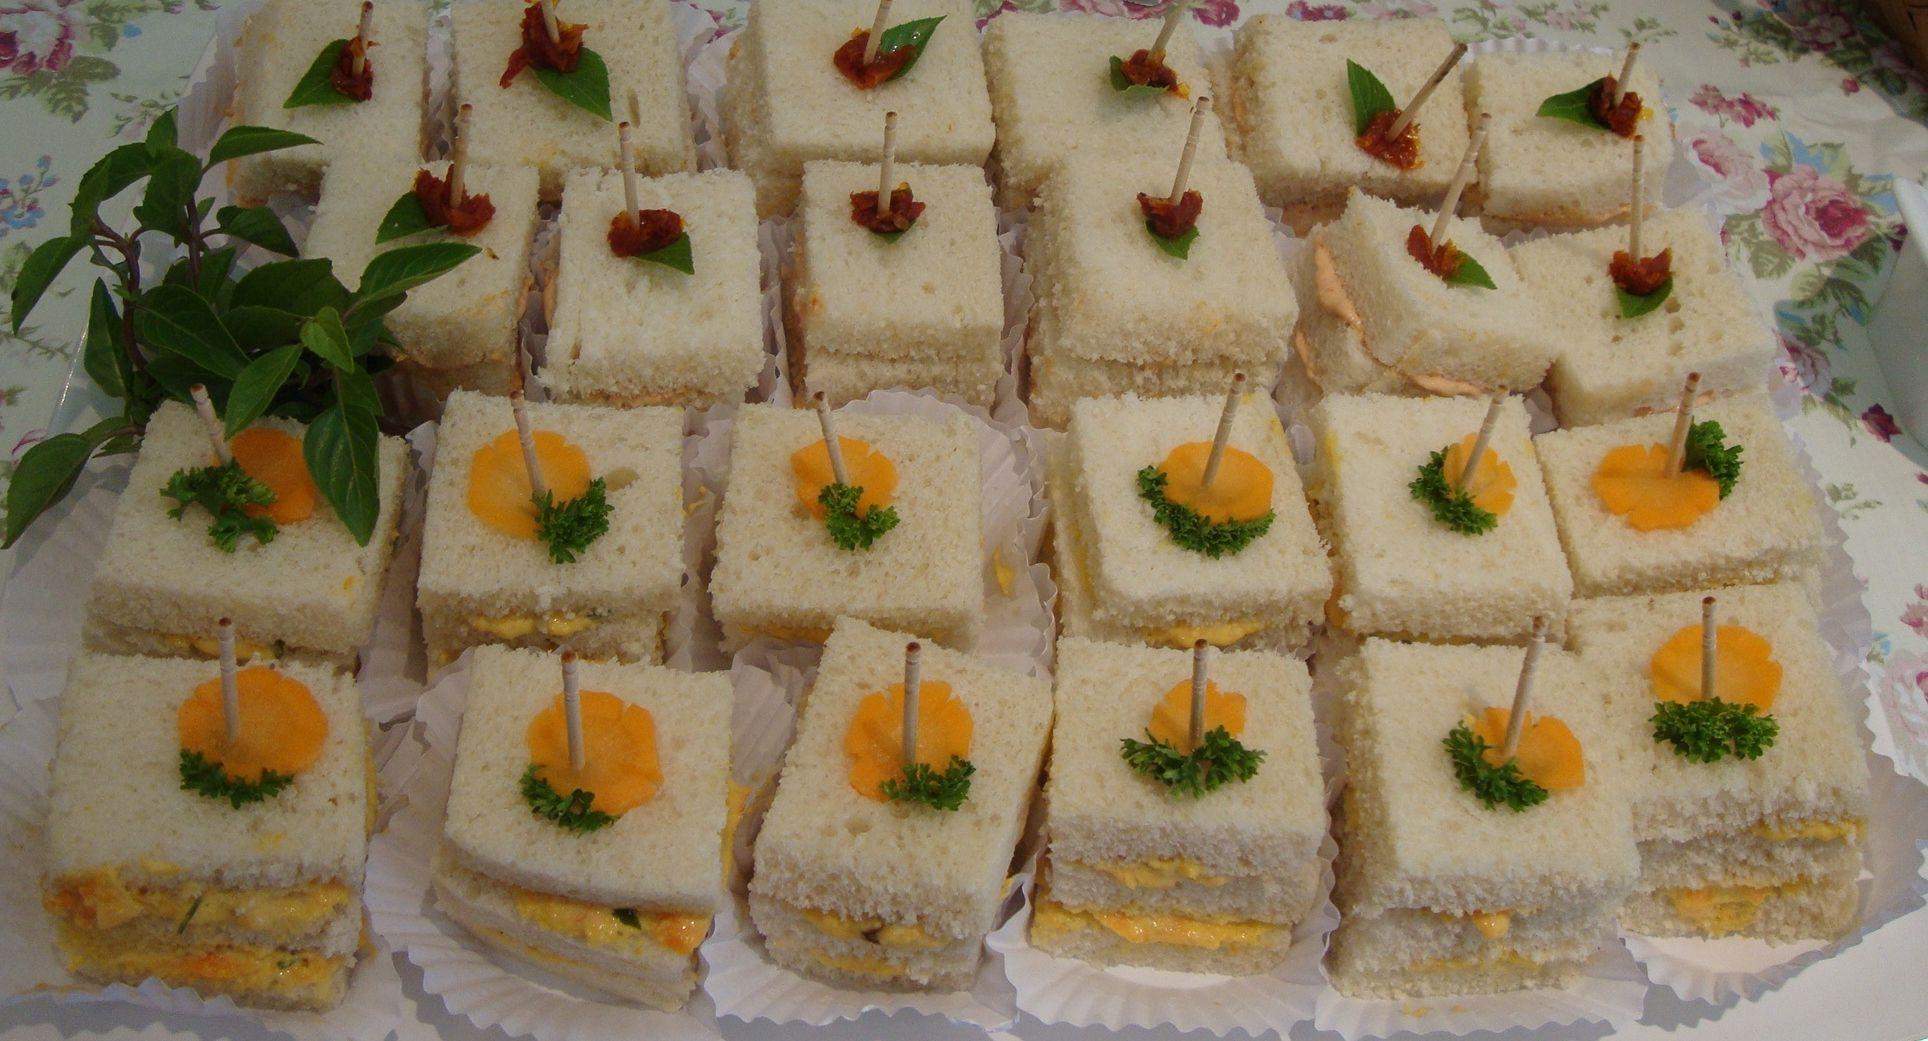 Oficina faça seu sanduíche natural - Foto 2